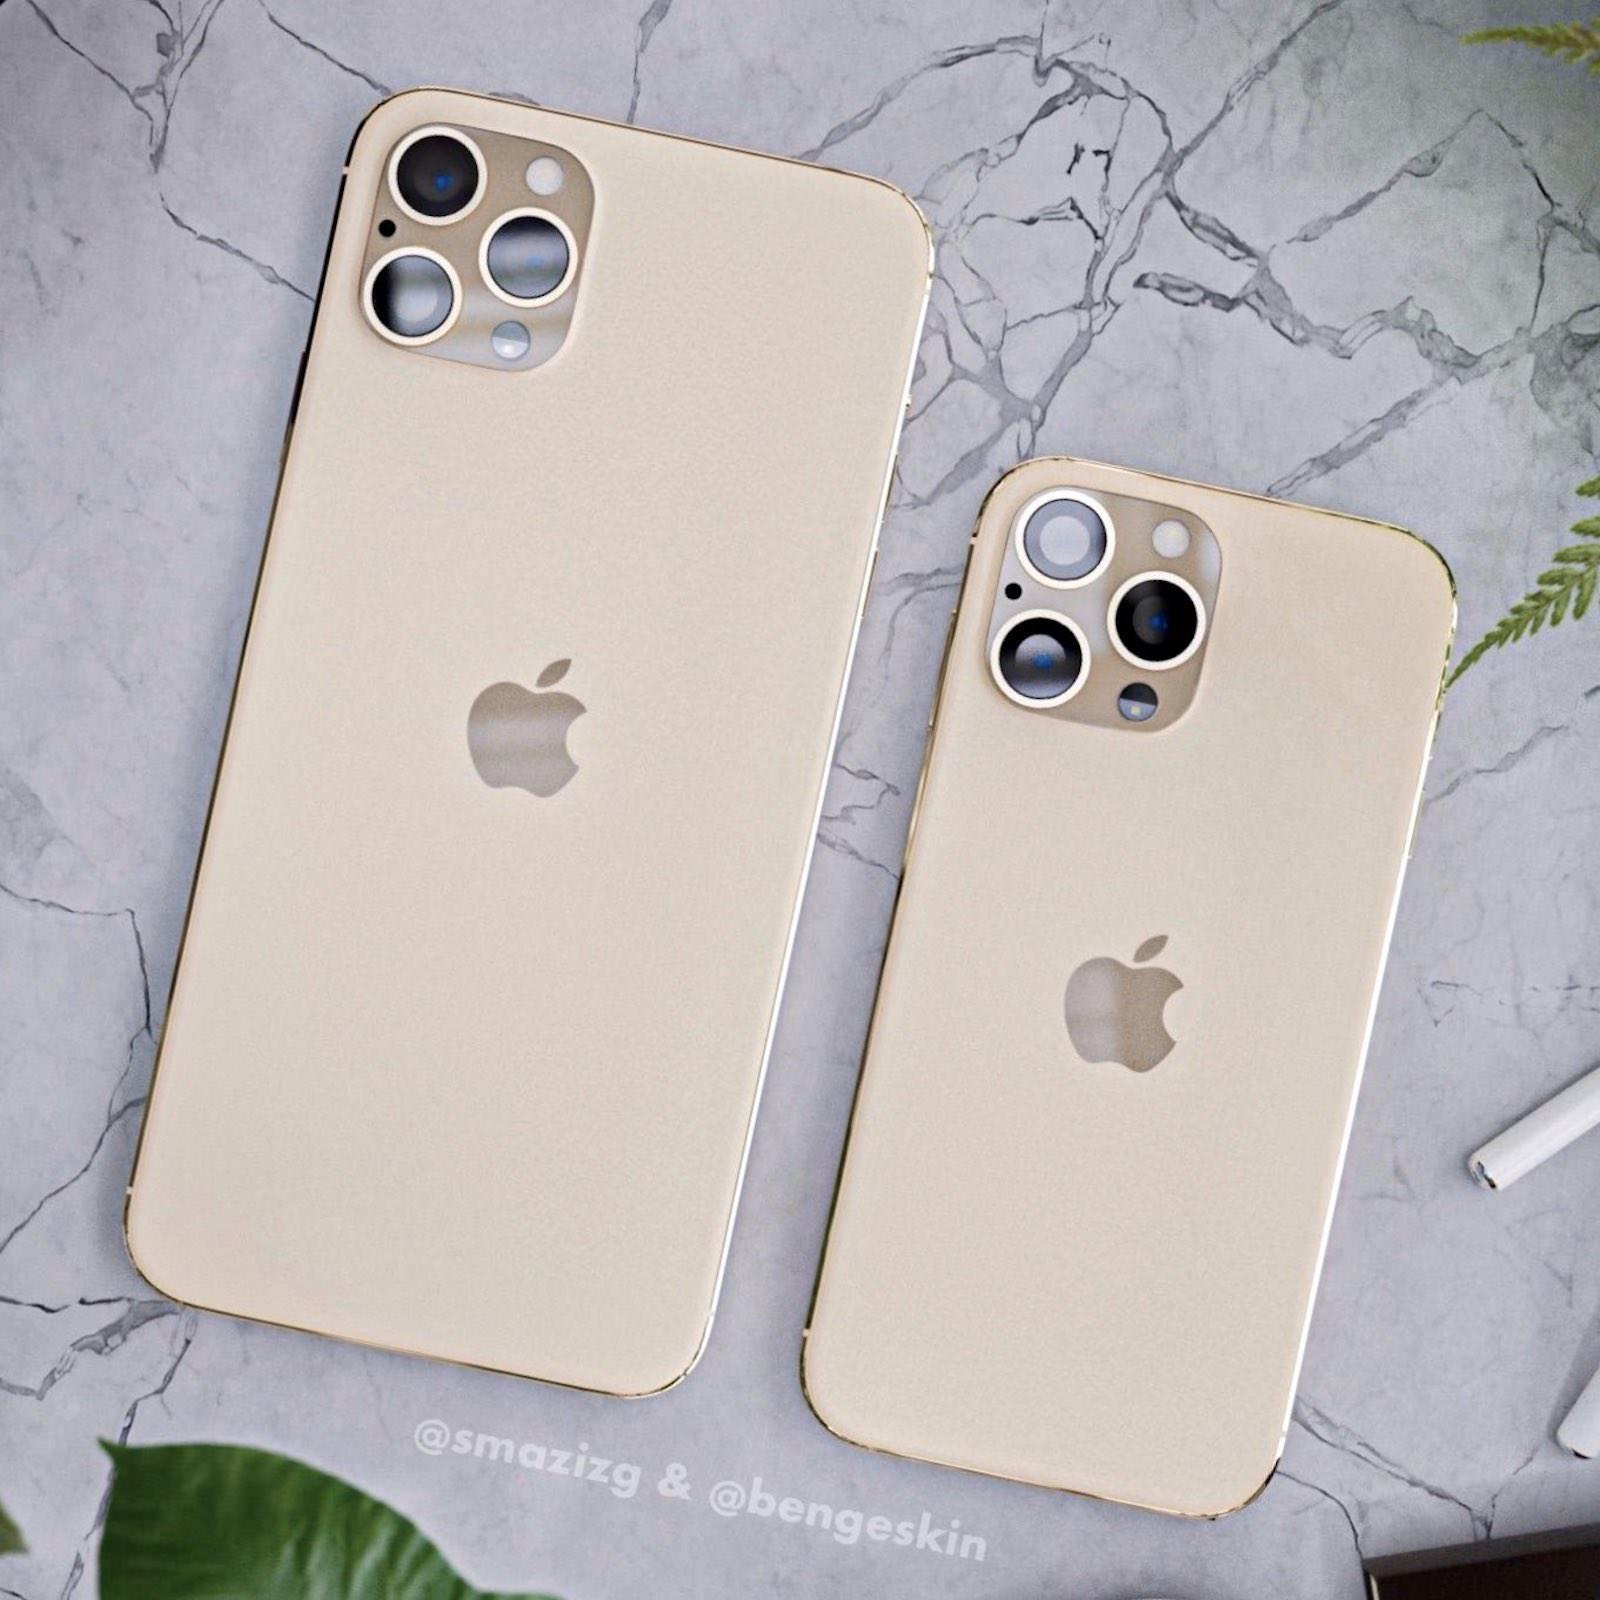 2020-iphone-concept-image.jpeg